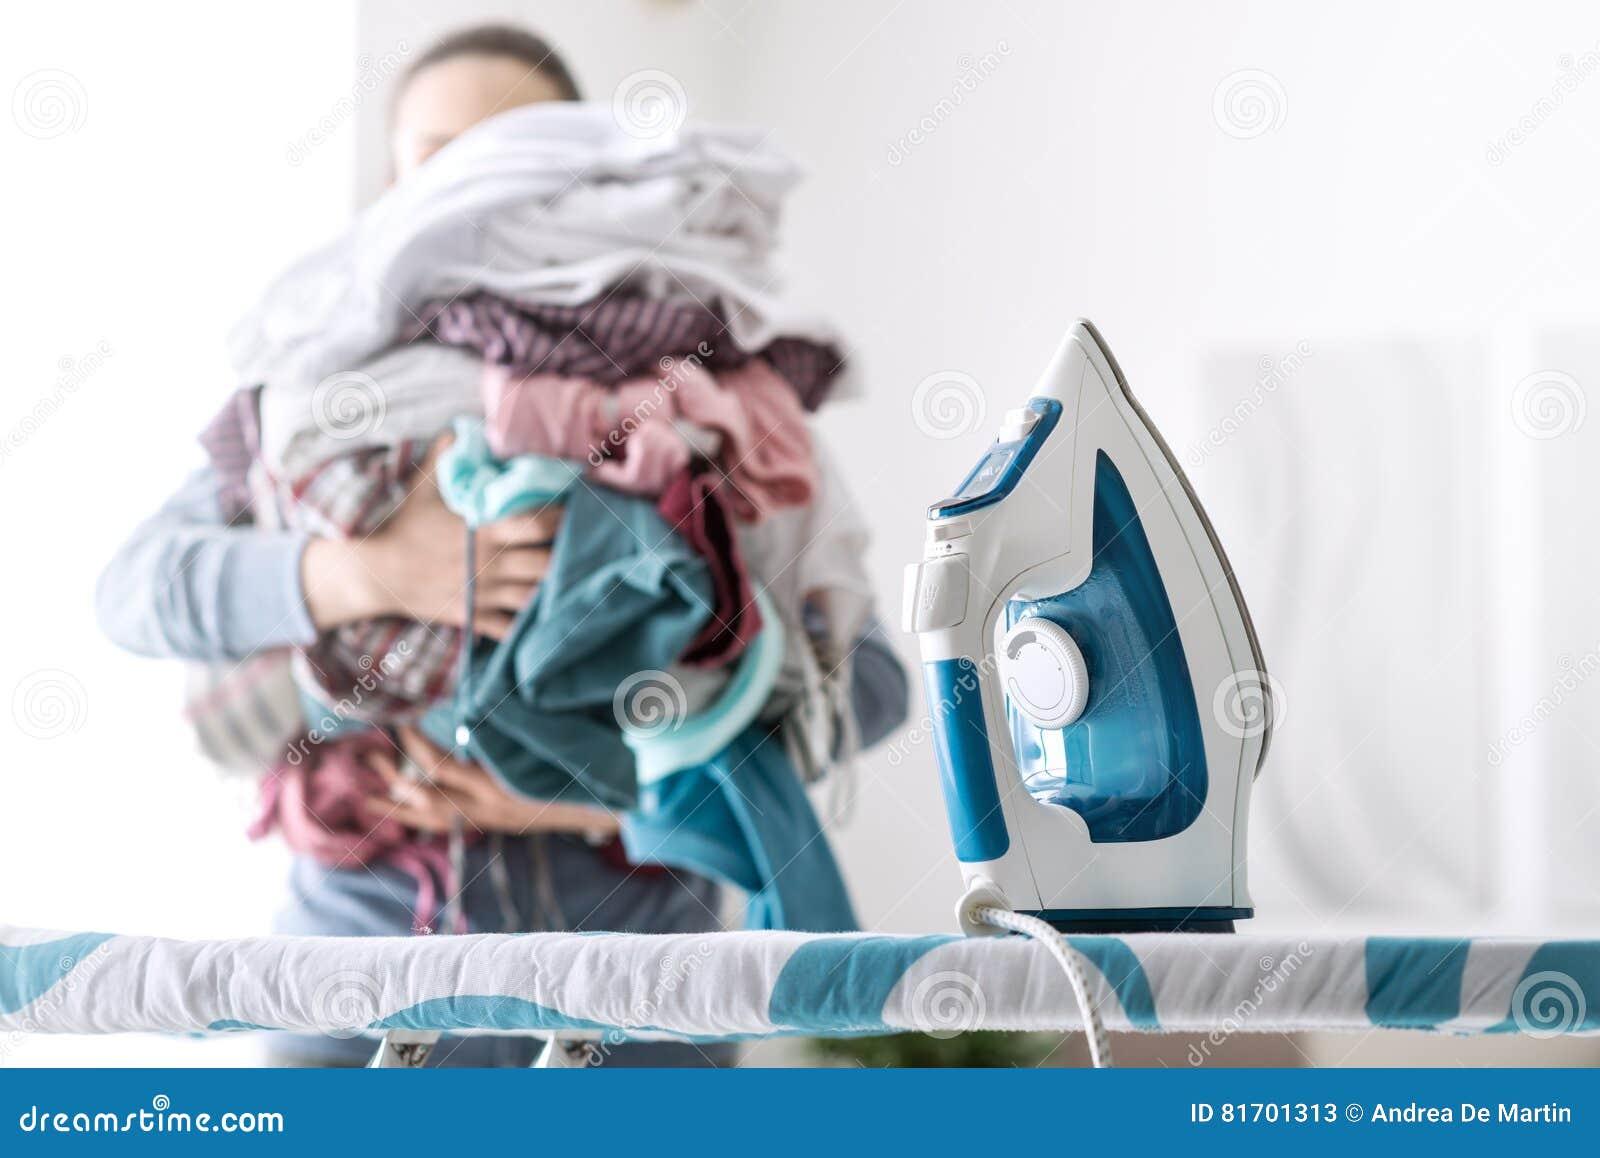 Travaux du ménage ennuyeux